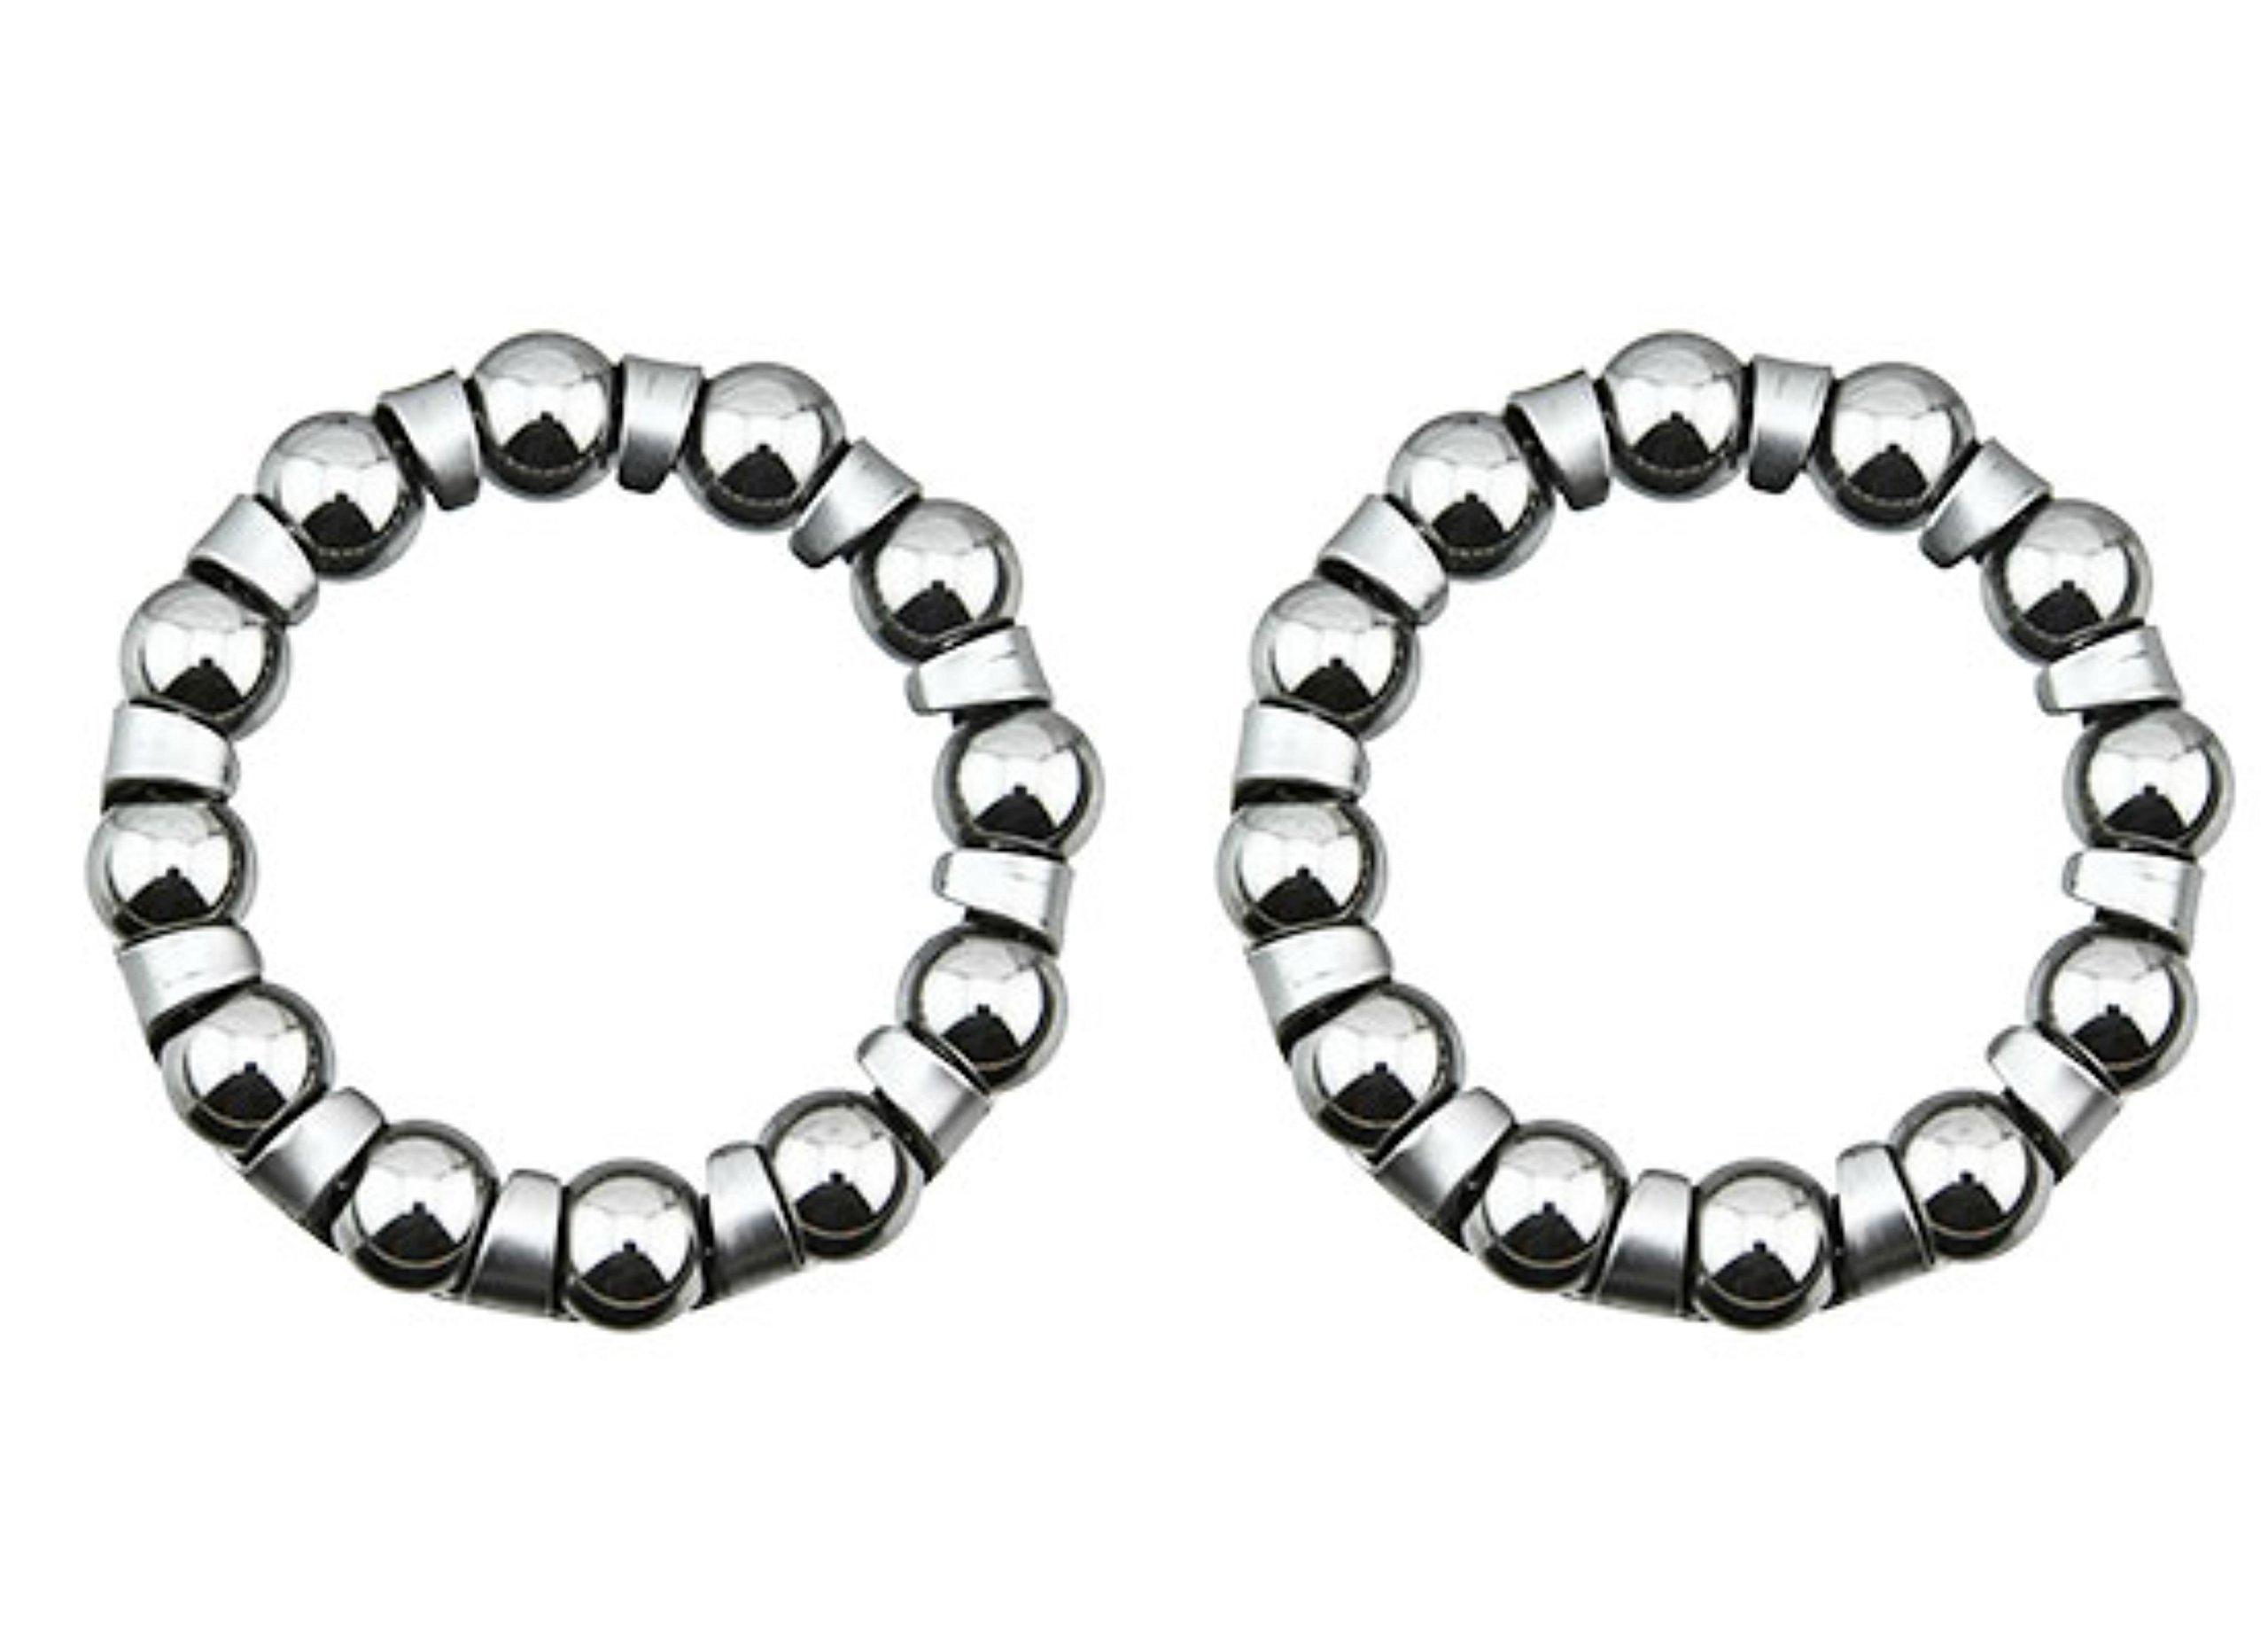 Lowrider 2-1 Piece Crank Bearing 5/16'' ball size x 12 balls. Set of bearing. Pair of bearings. for bicycle crank, bike crank, bikes